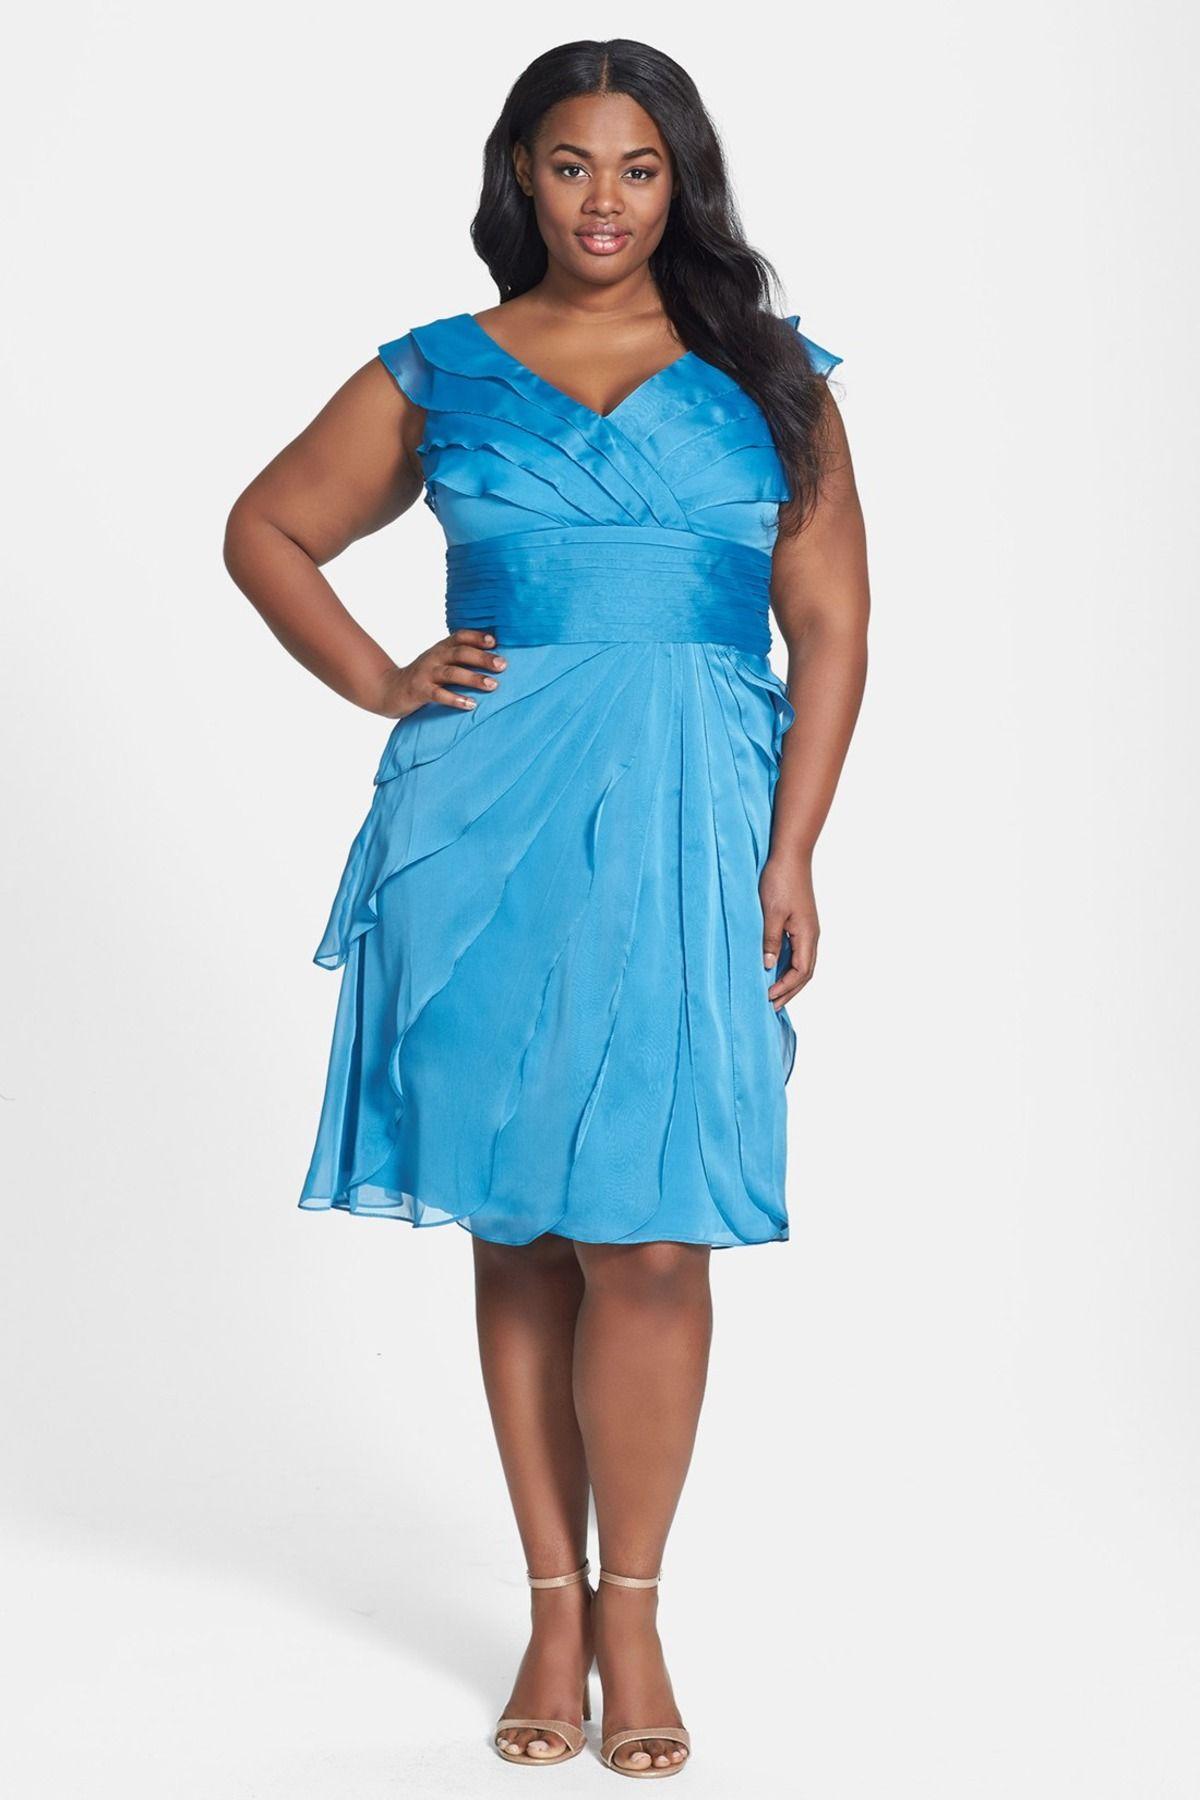 Plus Size Formal Dresses At Nordstrom | Saddha